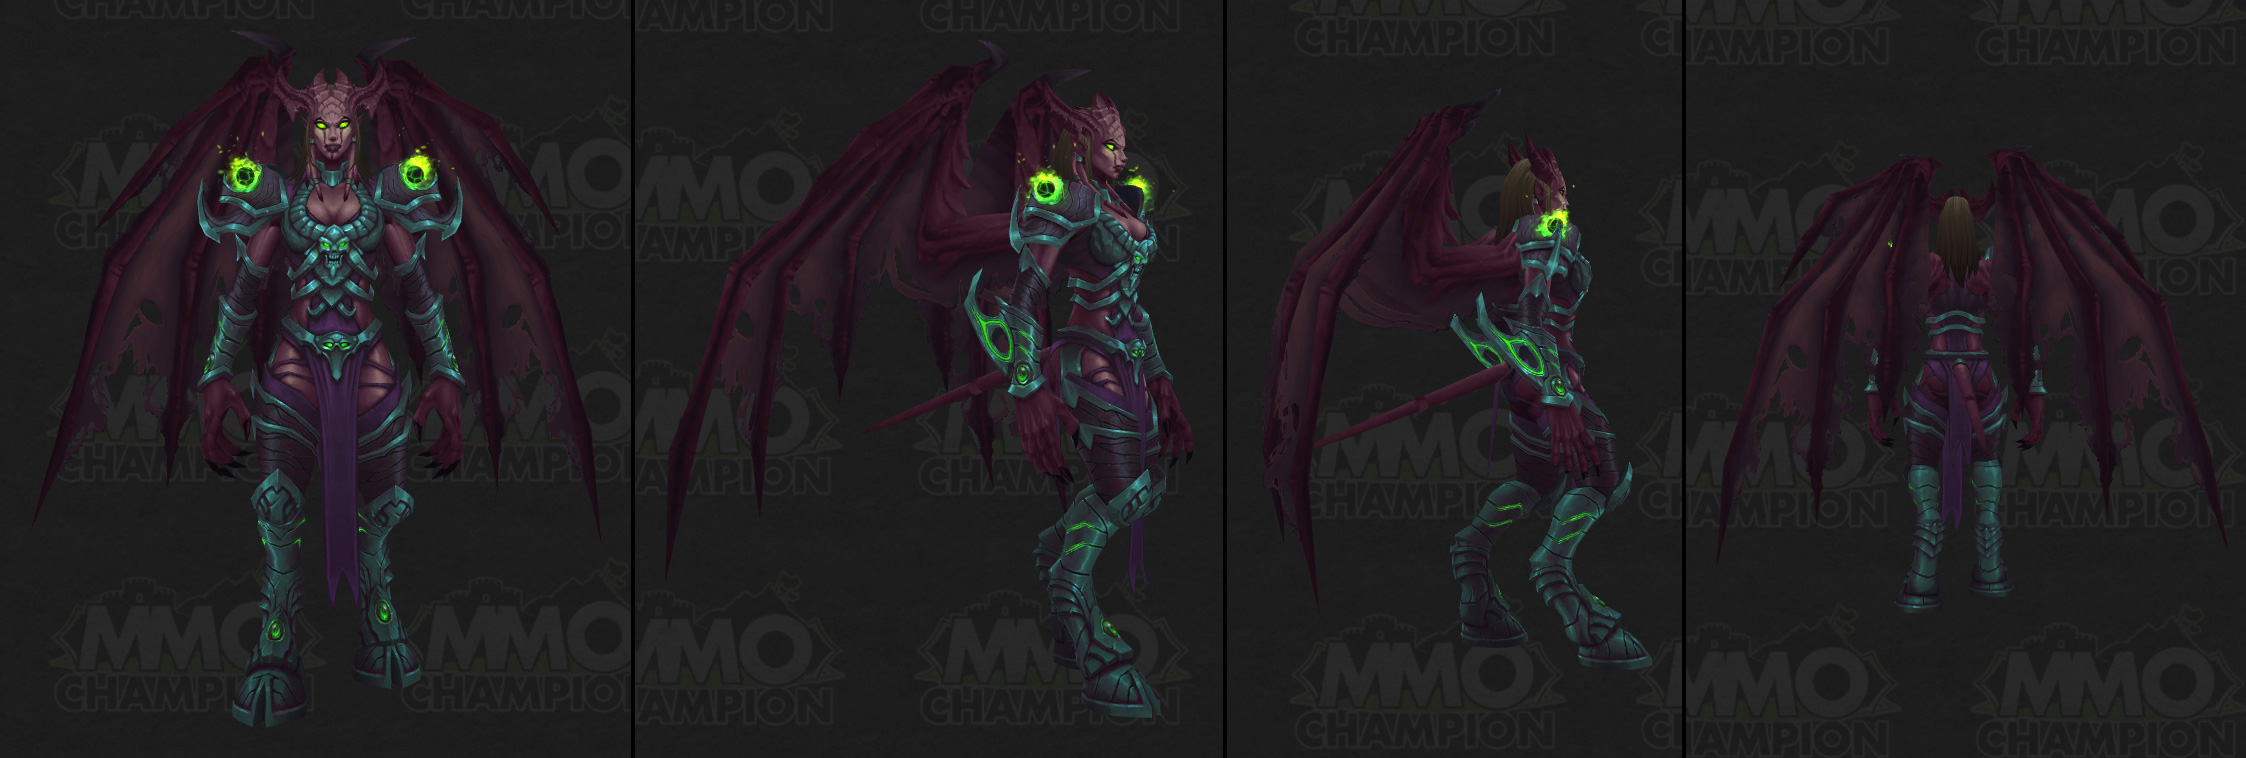 WoW Creature Argus Winged Eredar